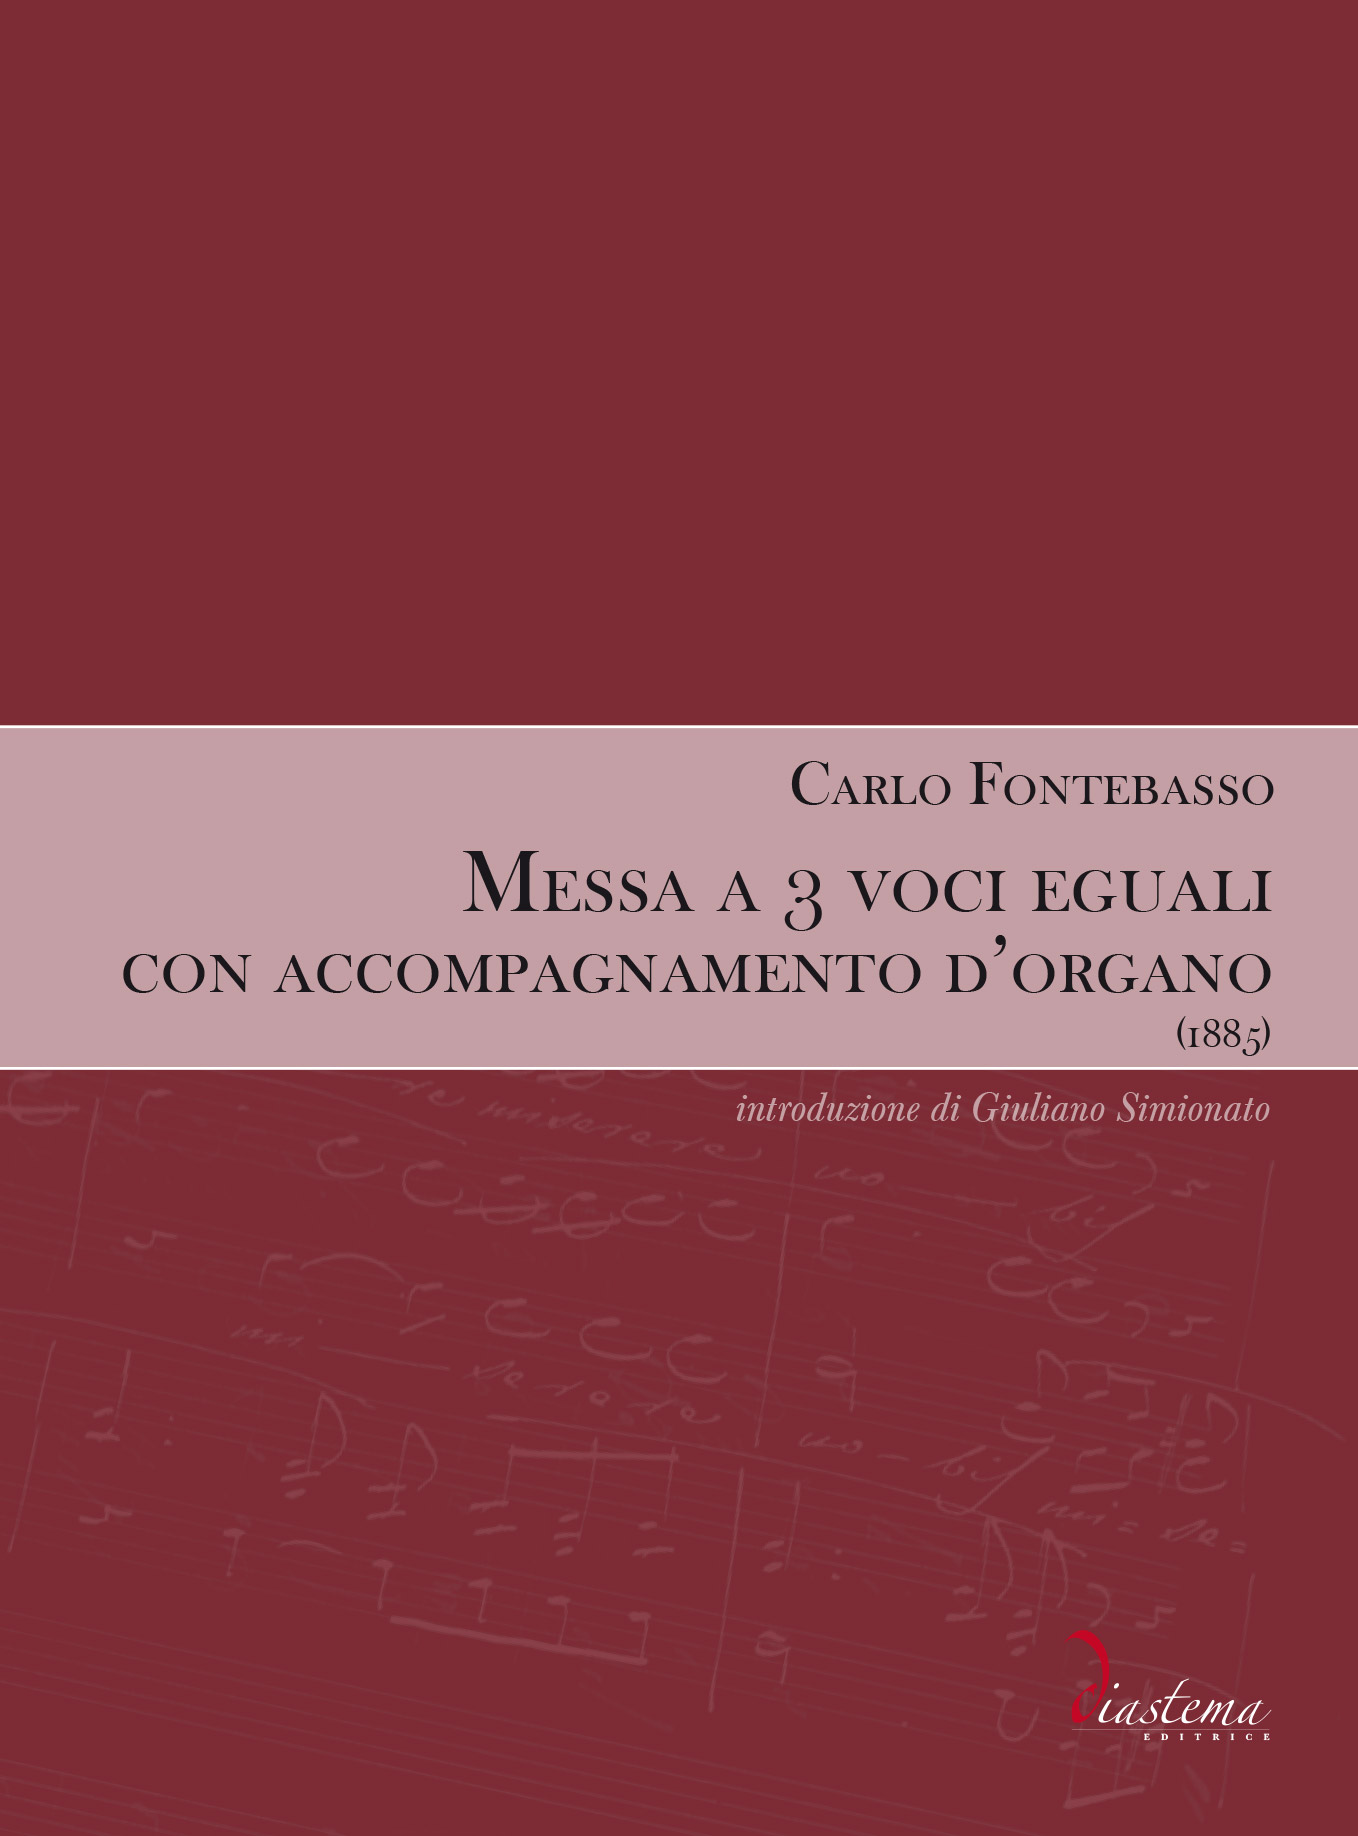 "<strong><span style=""color: #000000;"">Carlo Fontebasso<p><span style=""color: #9a2a32;""><strong>Messa a 3 voci eguali con accompagnamento d'organo (1885)</strong><br><span style=""color: #000000;"">introduzione di Giuliano Simionato</strong></p>"